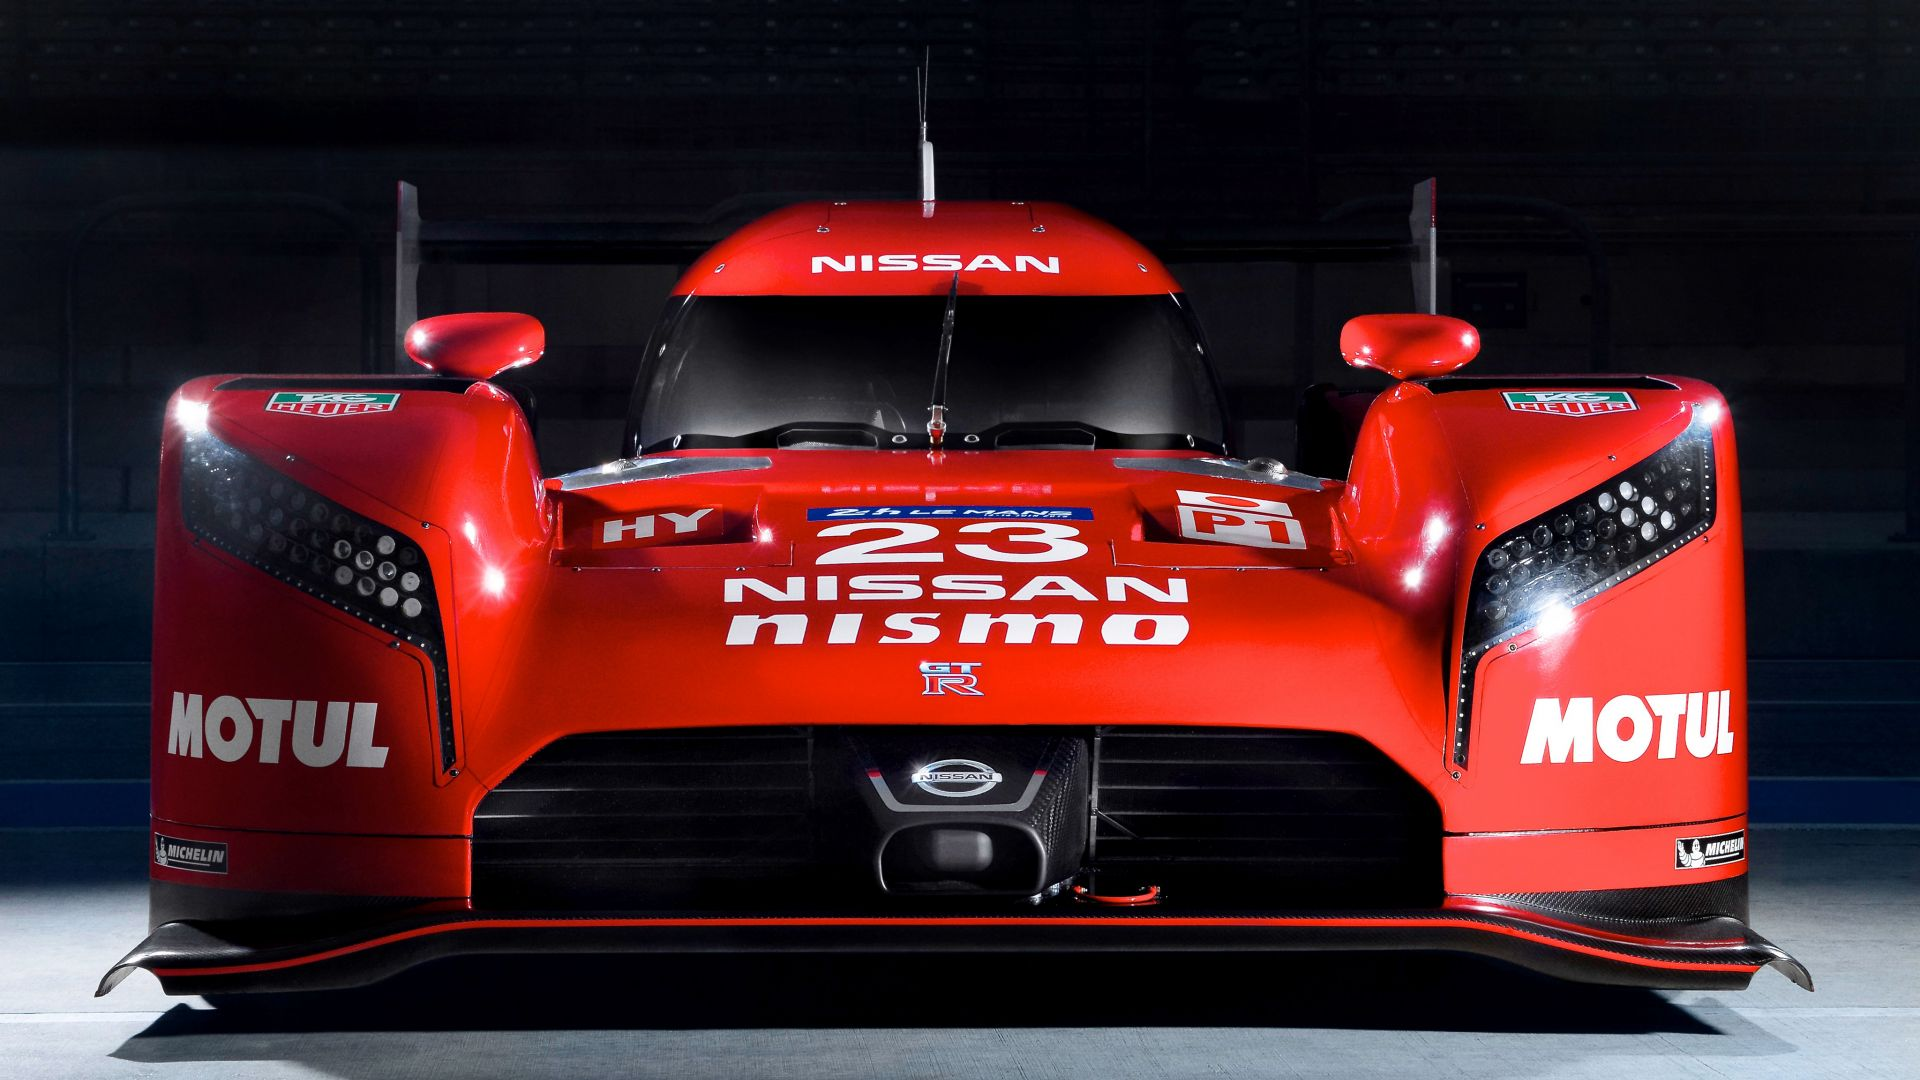 Wallpaper Nissan GT-R LM Nismo prototype racing car